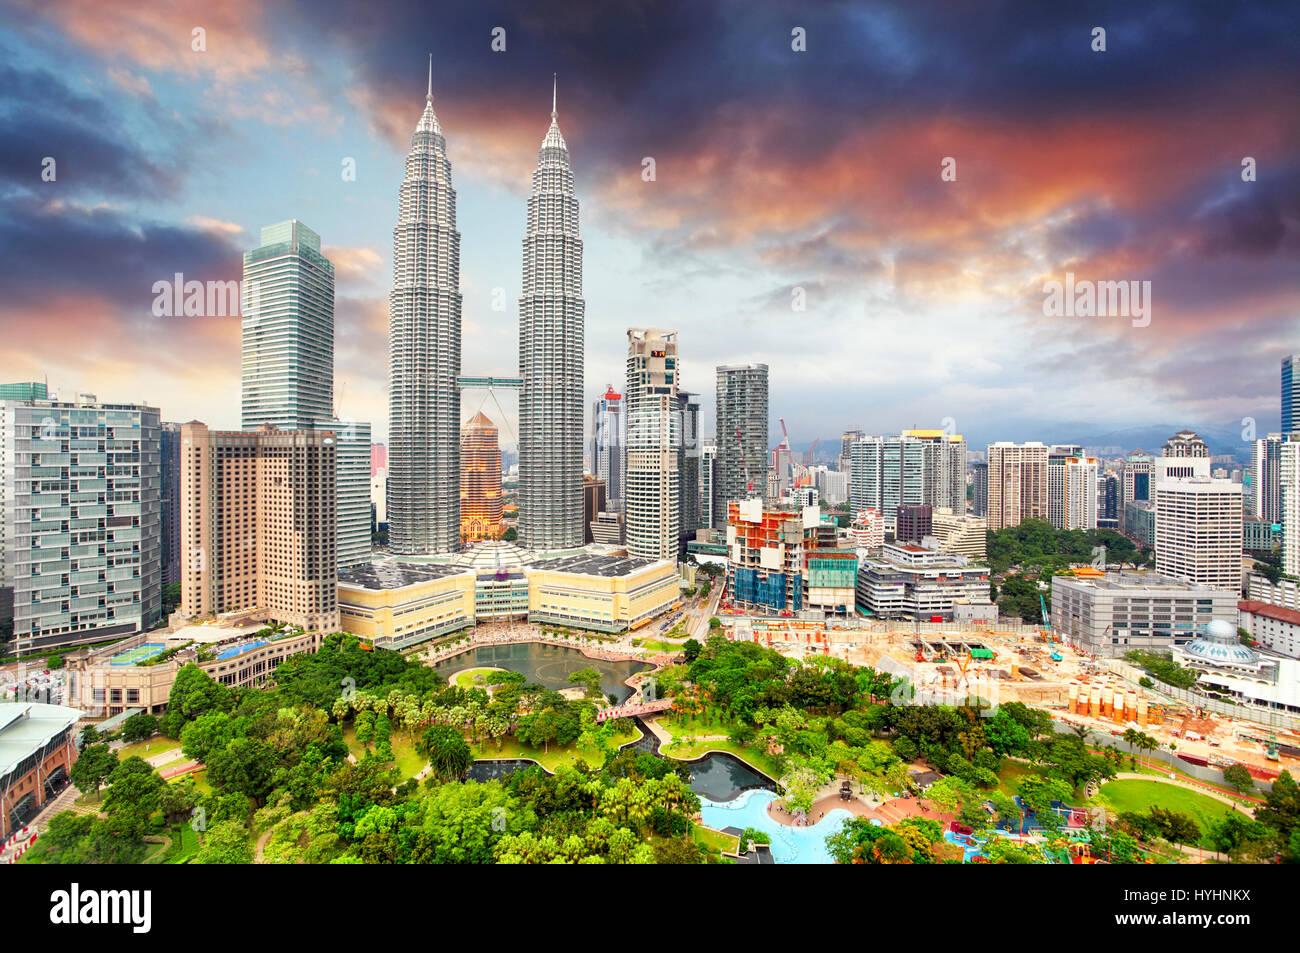 Kuala Lumpur, Malaysia skyline. - Stock Image